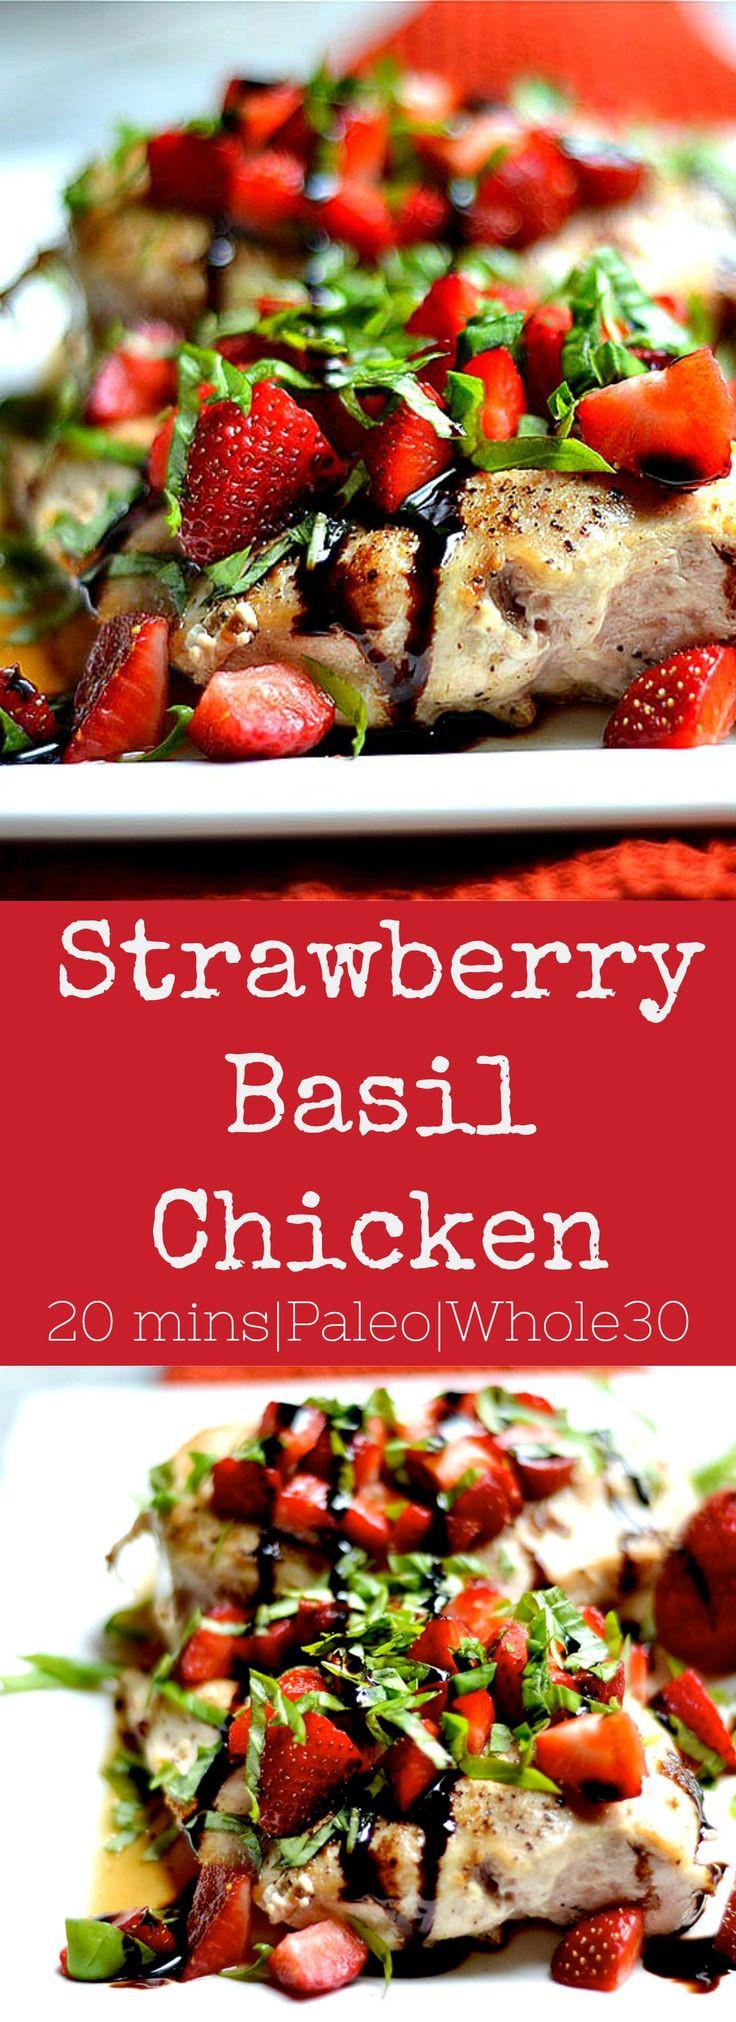 Healthy Kid Friendly Chicken Recipes  25 great ideas about Healthy Chicken Recipes on Pinterest